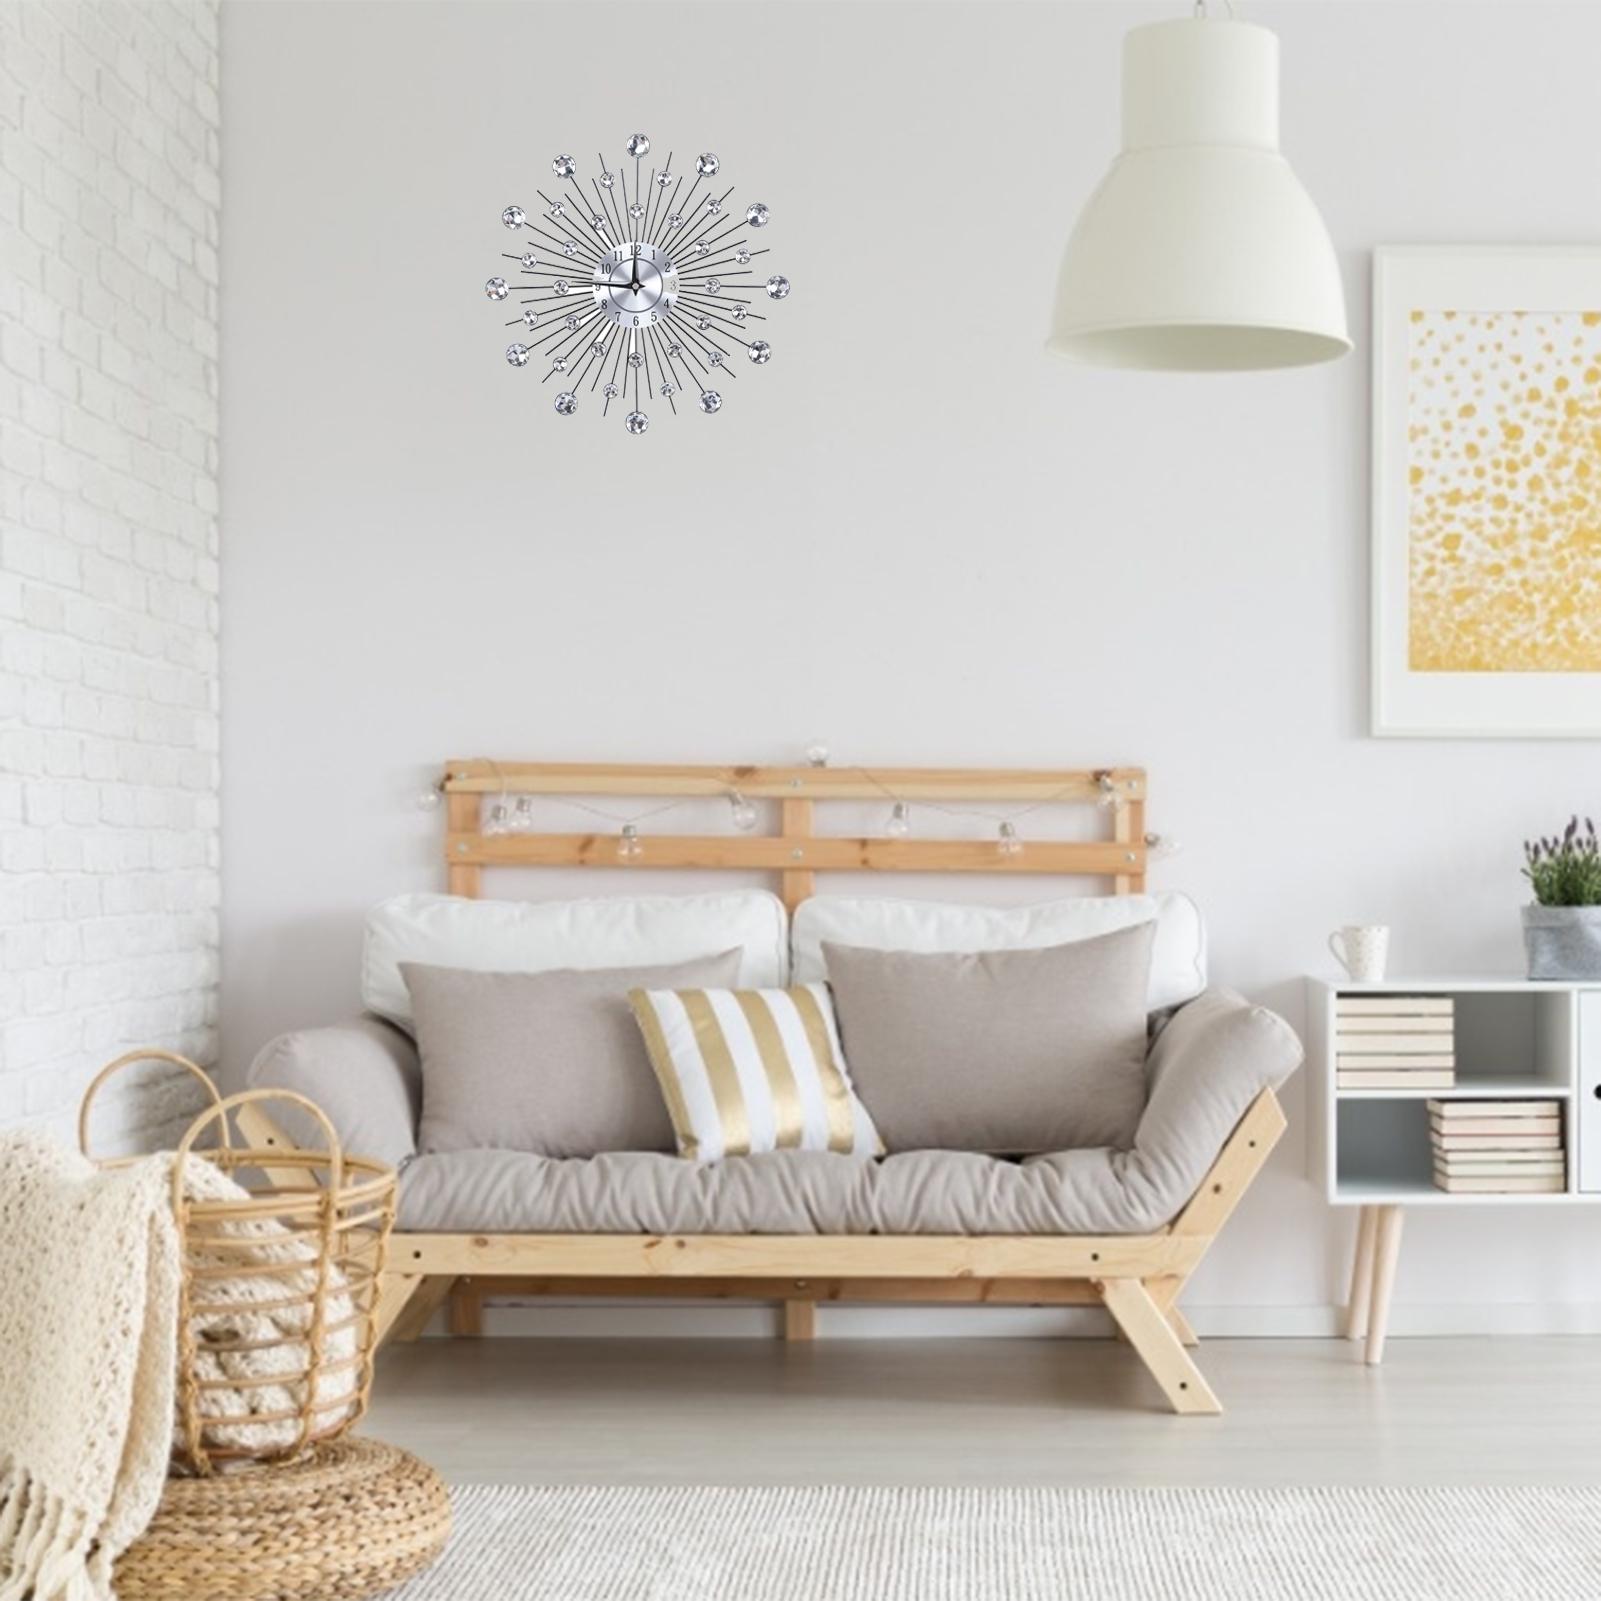 Sparkling-Bling-Metallic-DIY-Flower-Shaped-Wall-Clock-for-Living-Room-Office miniature 14